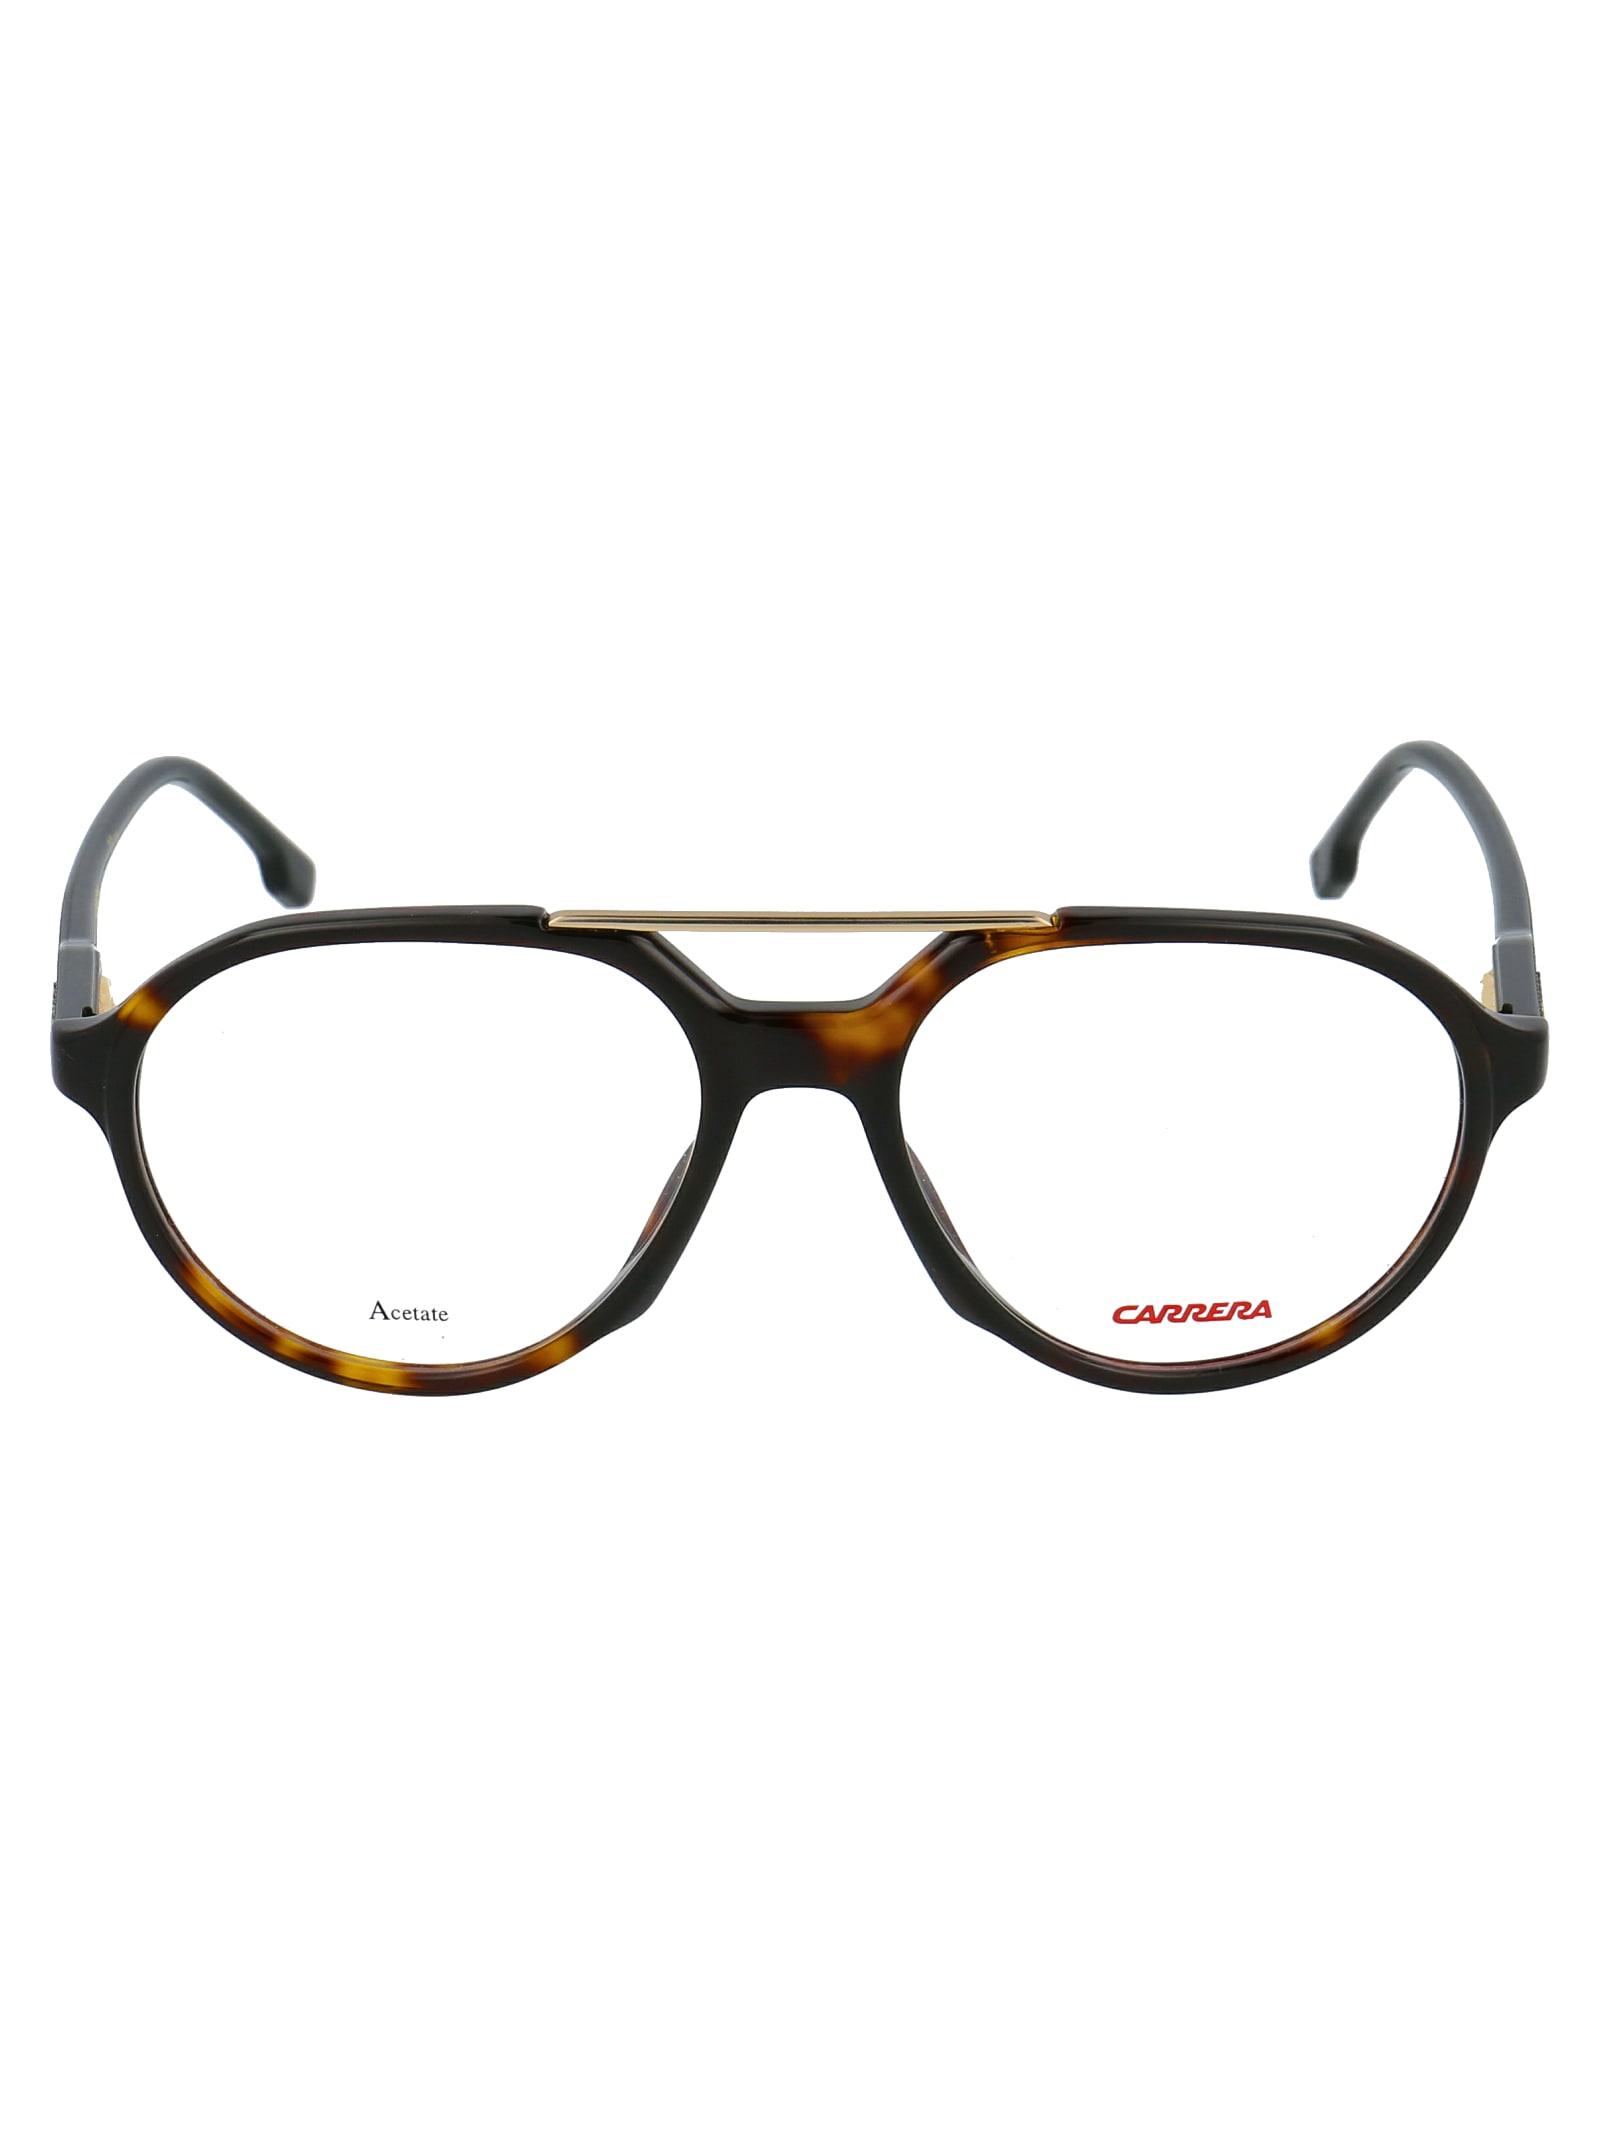 Carrera Glasses